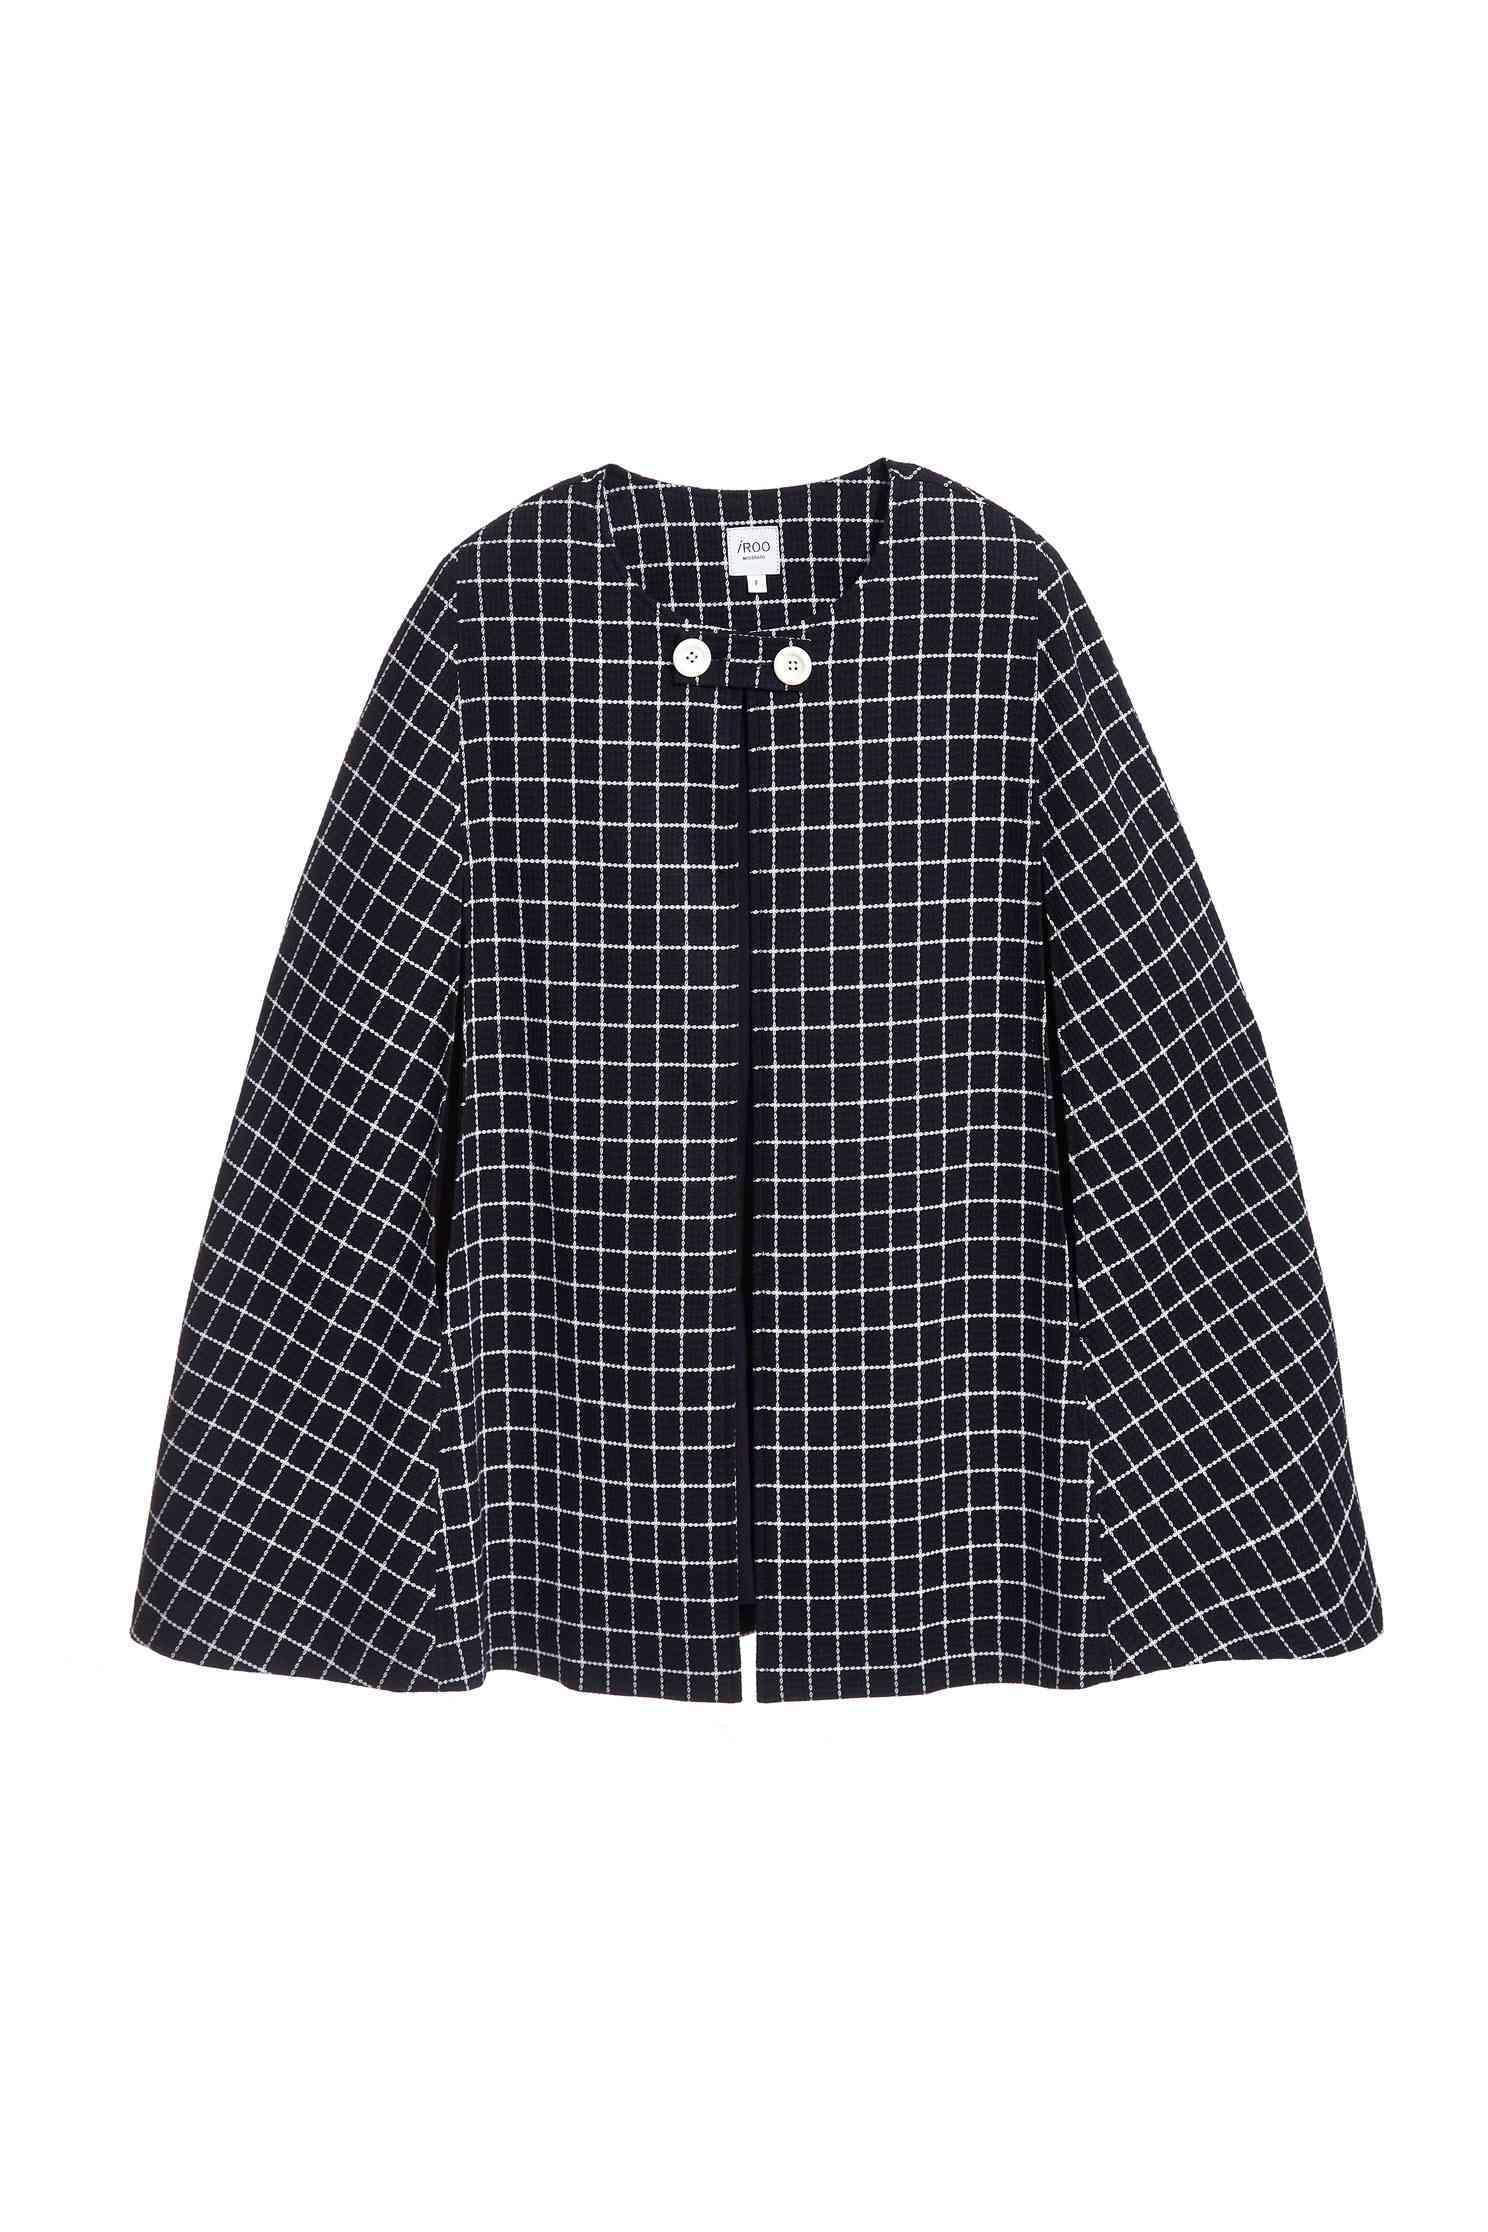 Navy blue england checkered long Sleeve blazer,outerwear,longsleeveouterwear